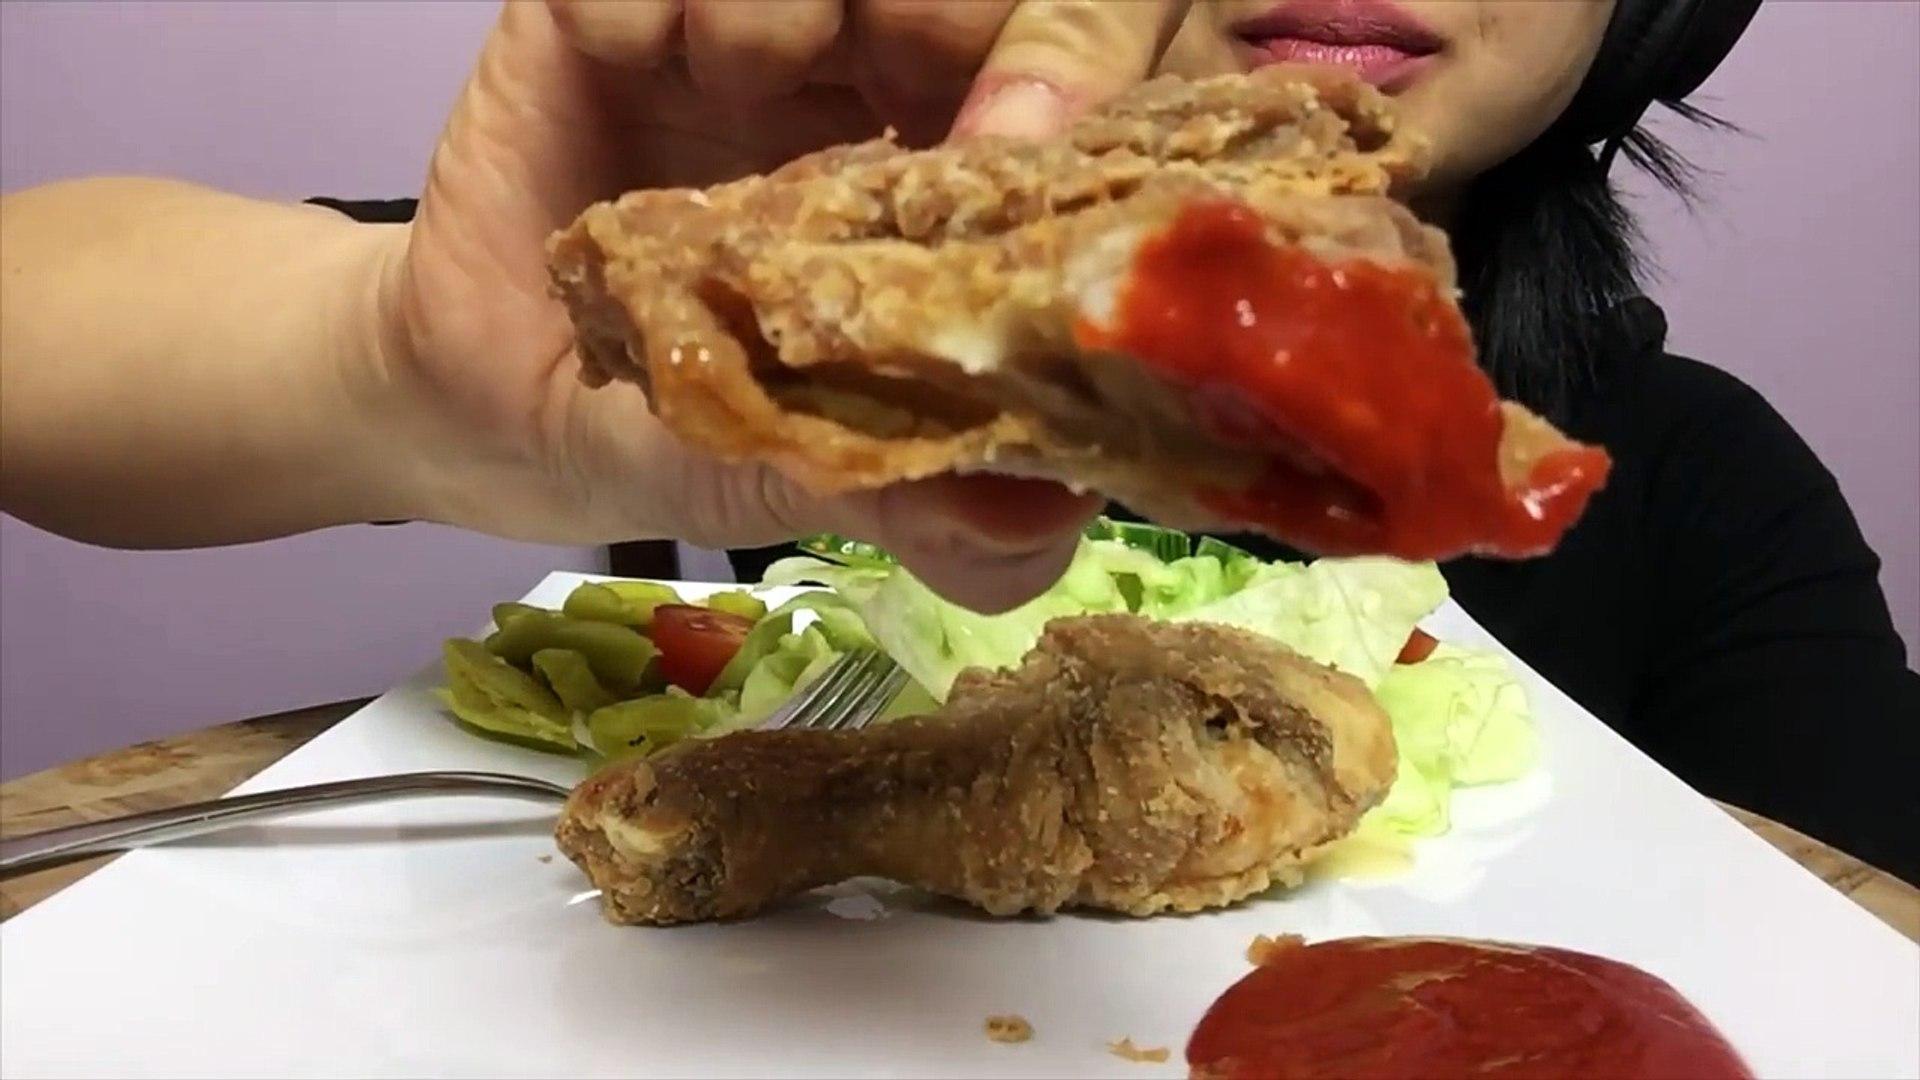 ASMR FRIED CHICKEN LETS GET COOKING (SATISFYING EATING SOUNDS) No Talking | SAS-ASMR